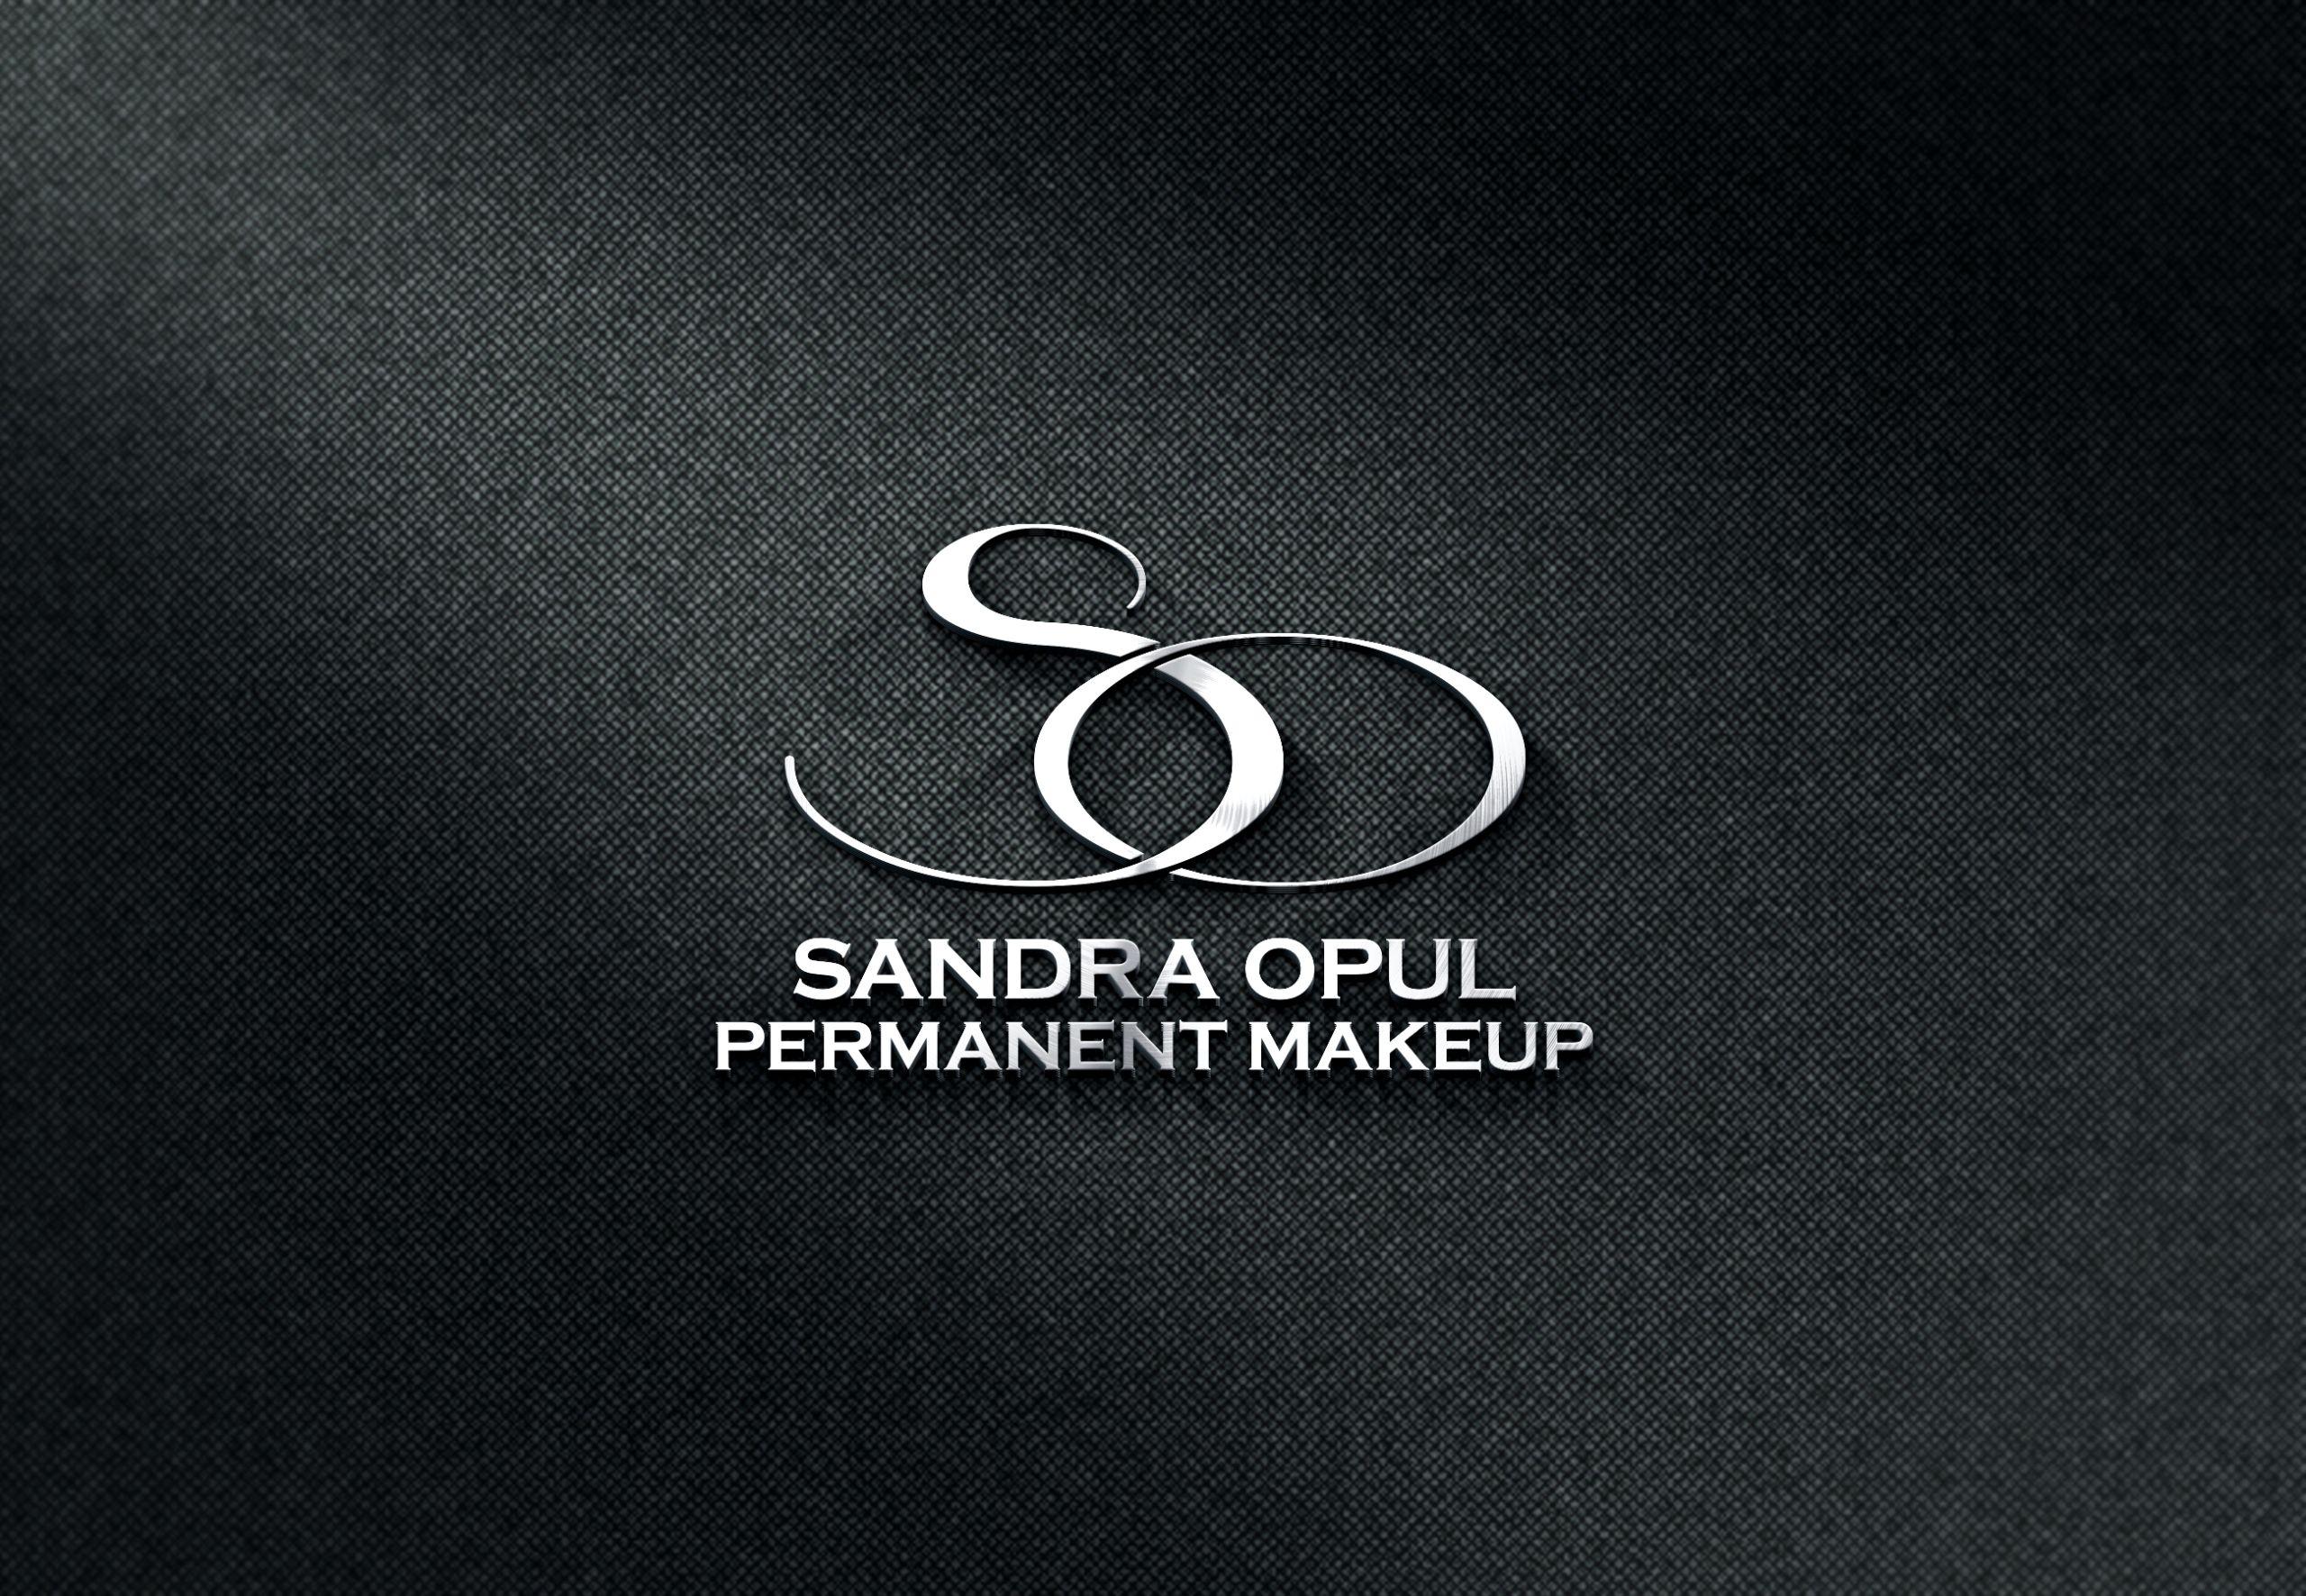 19_SO_Sandra_Opul_Permanent_Makeup_LOGO_prez